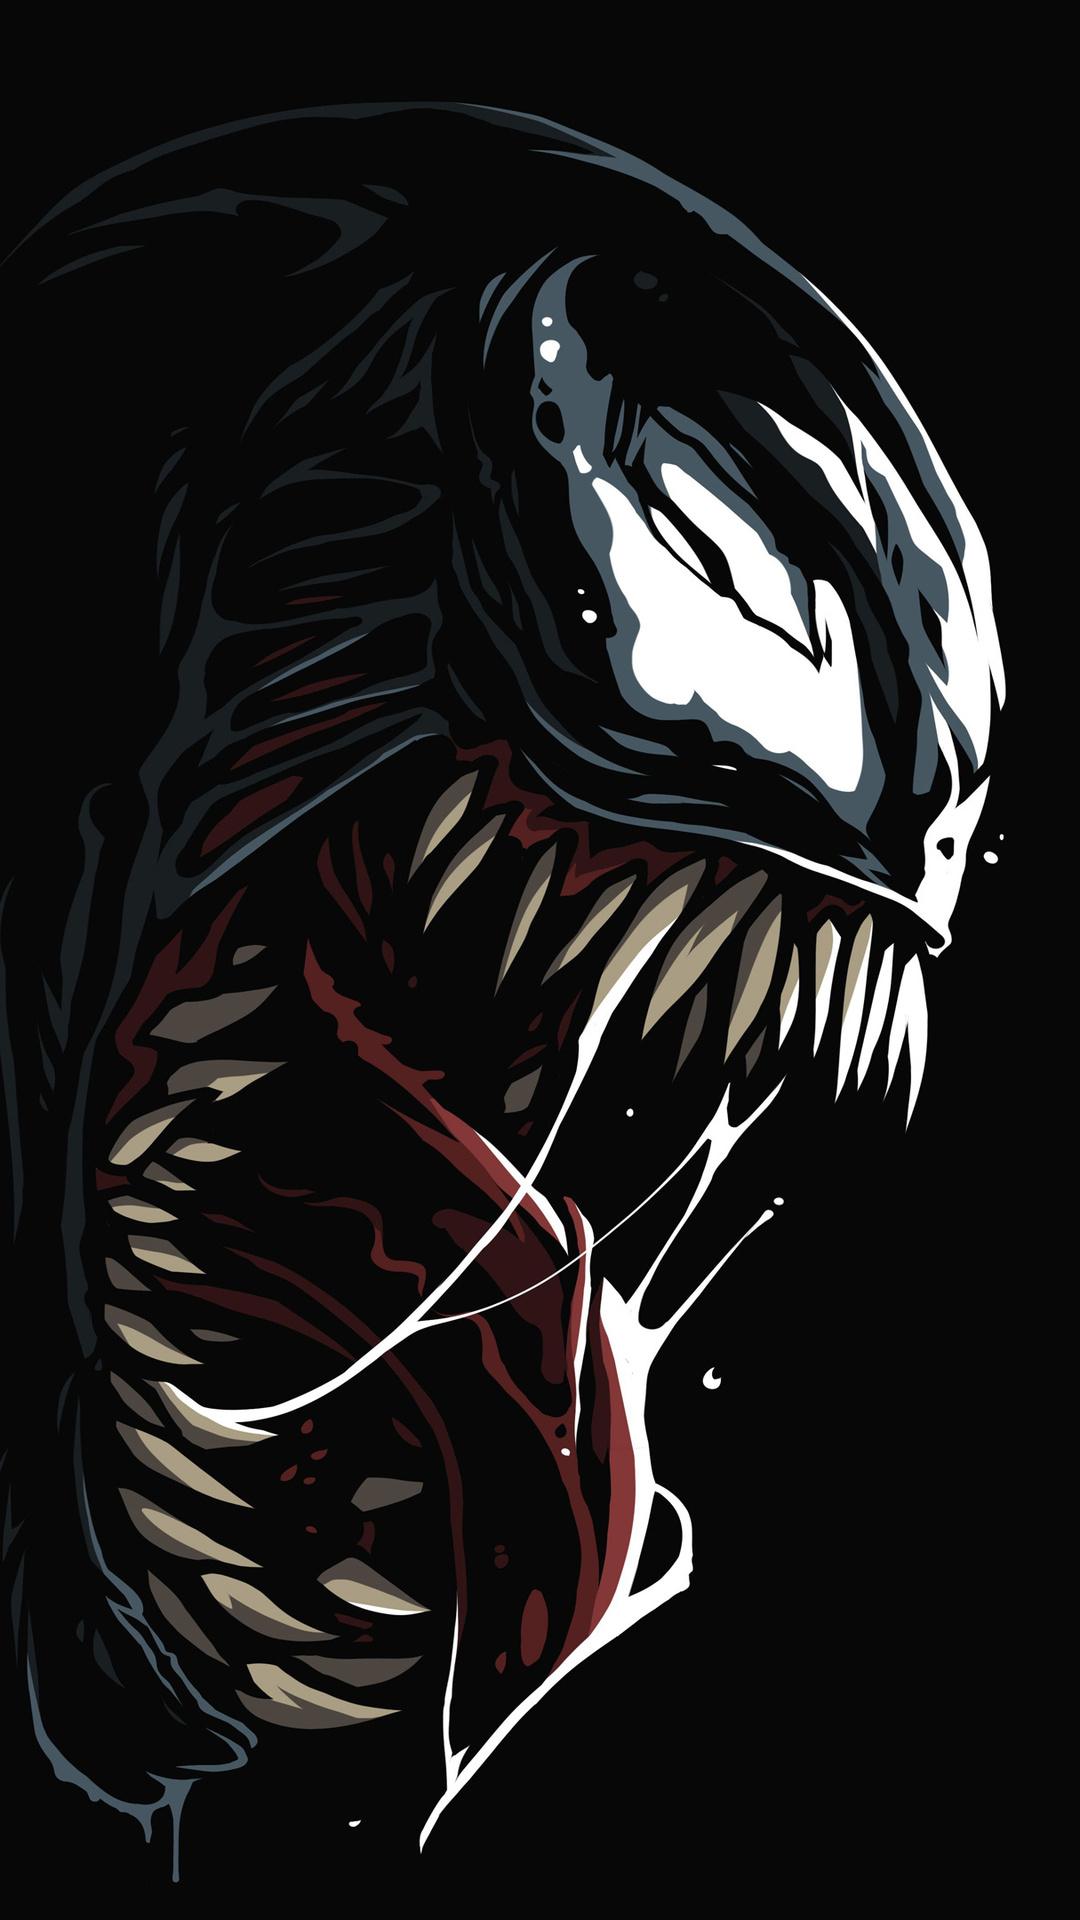 1080x1920 Venom Amoled 4k Iphone 76s6 Plus Pixel Xl One